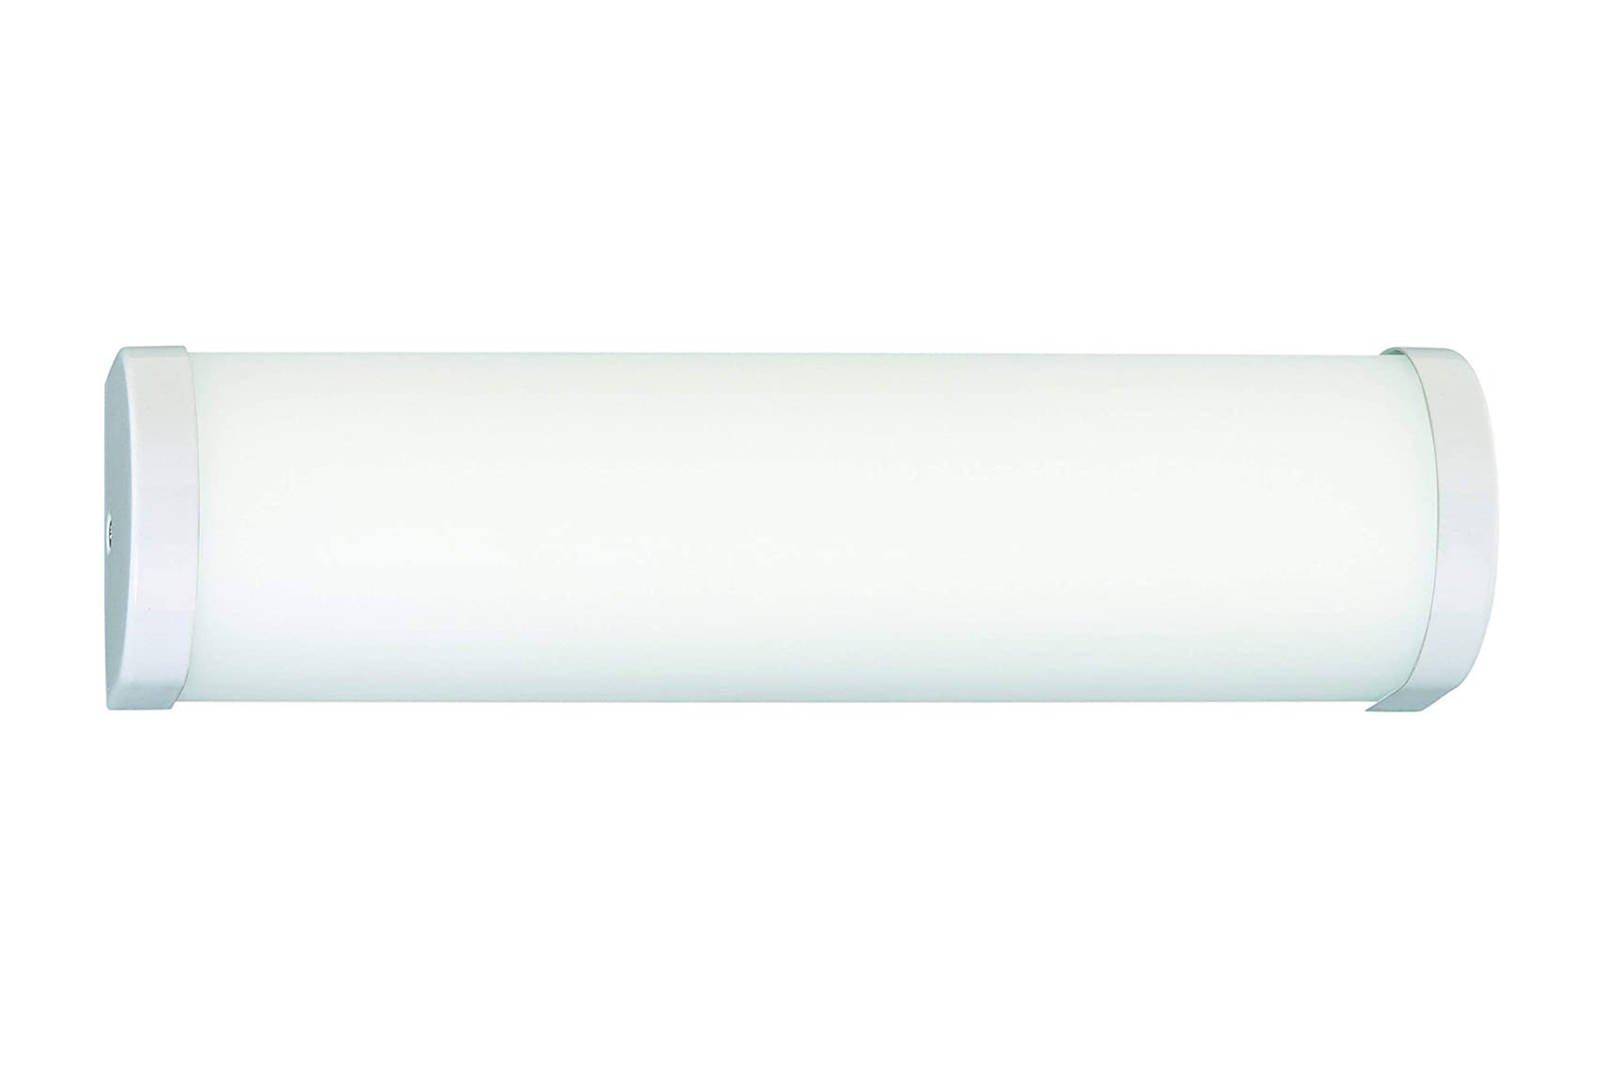 Bathroom wall lamp 2109-026 Briloner Splash 2xE14 / 40W